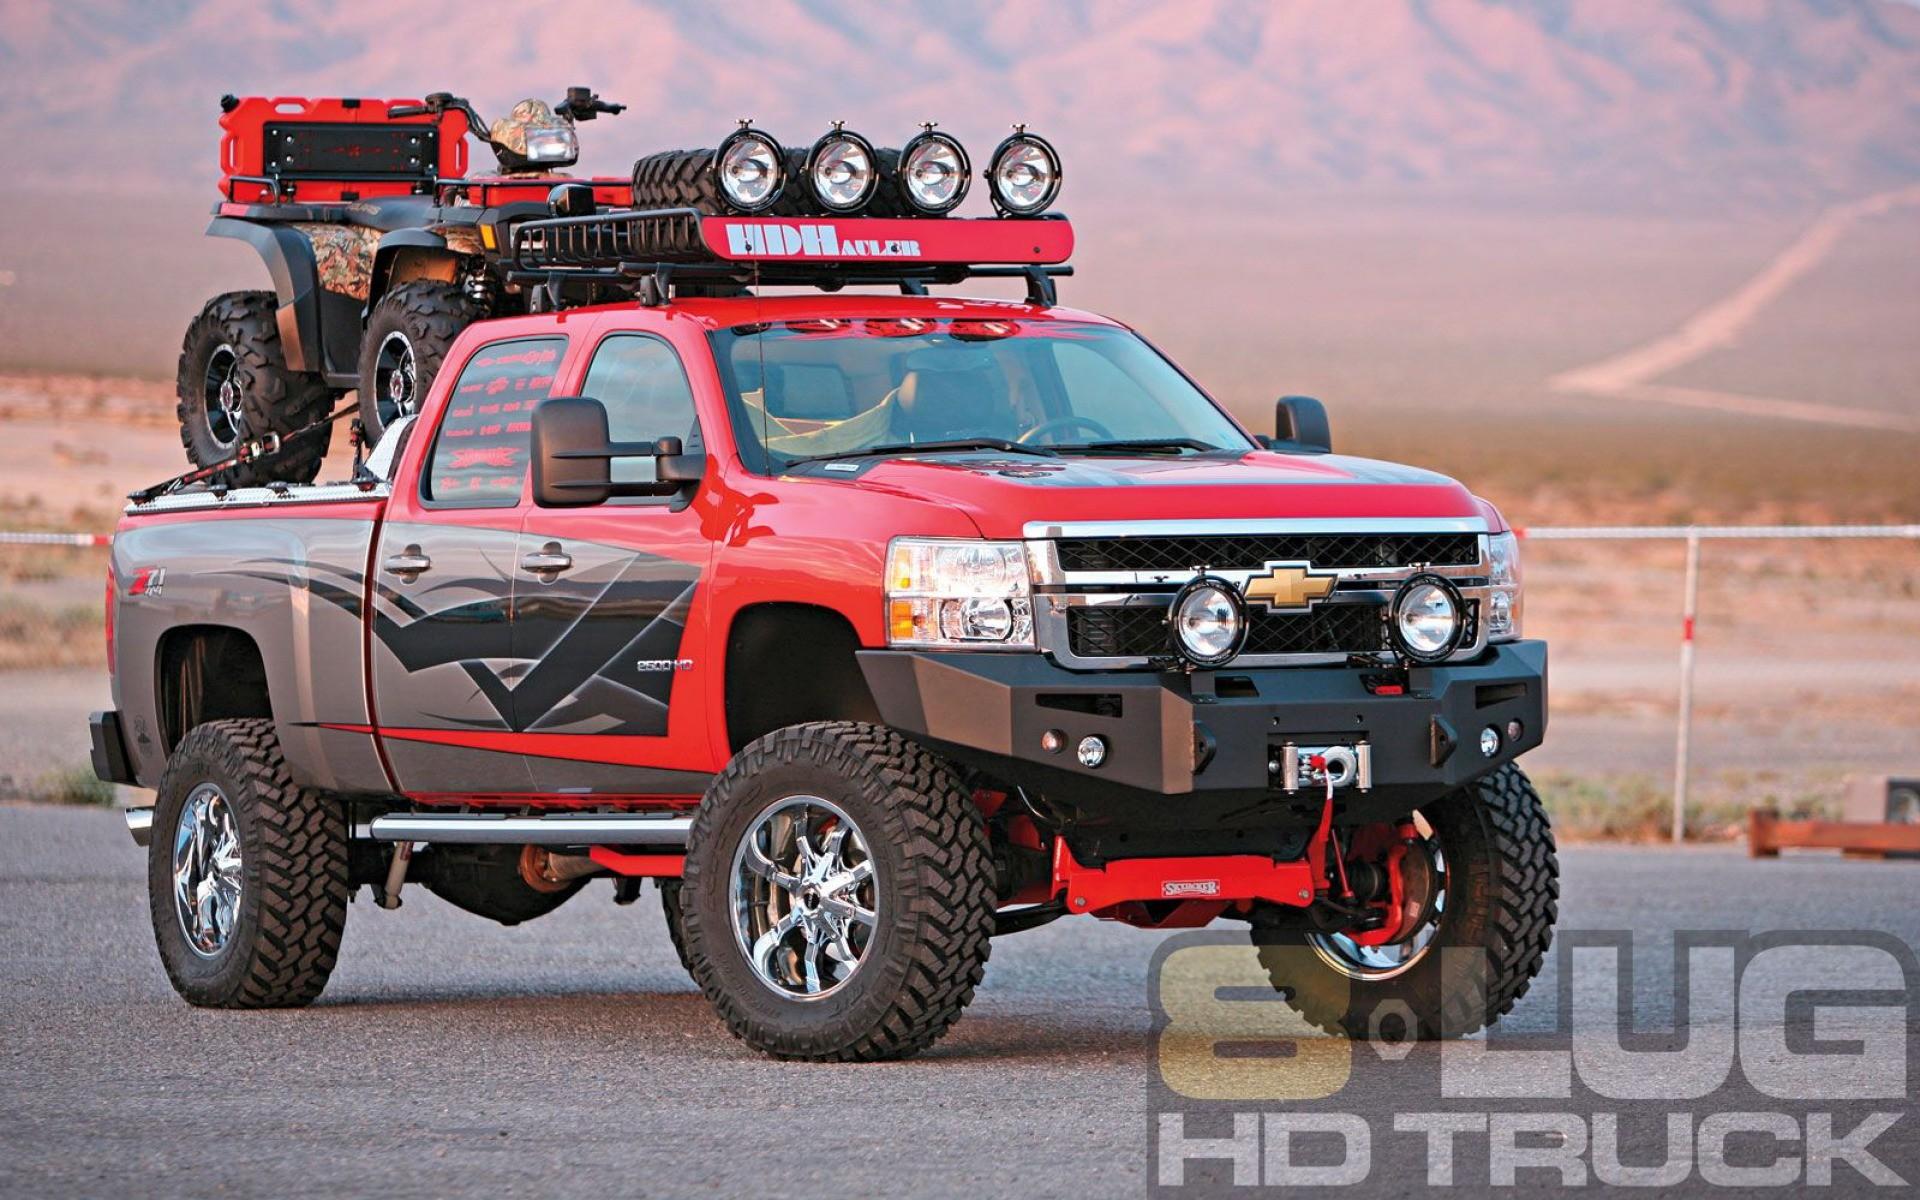 Hd Wallpapers Chevy Silverado Wallpaper Lifted Trucks Black Dragon .